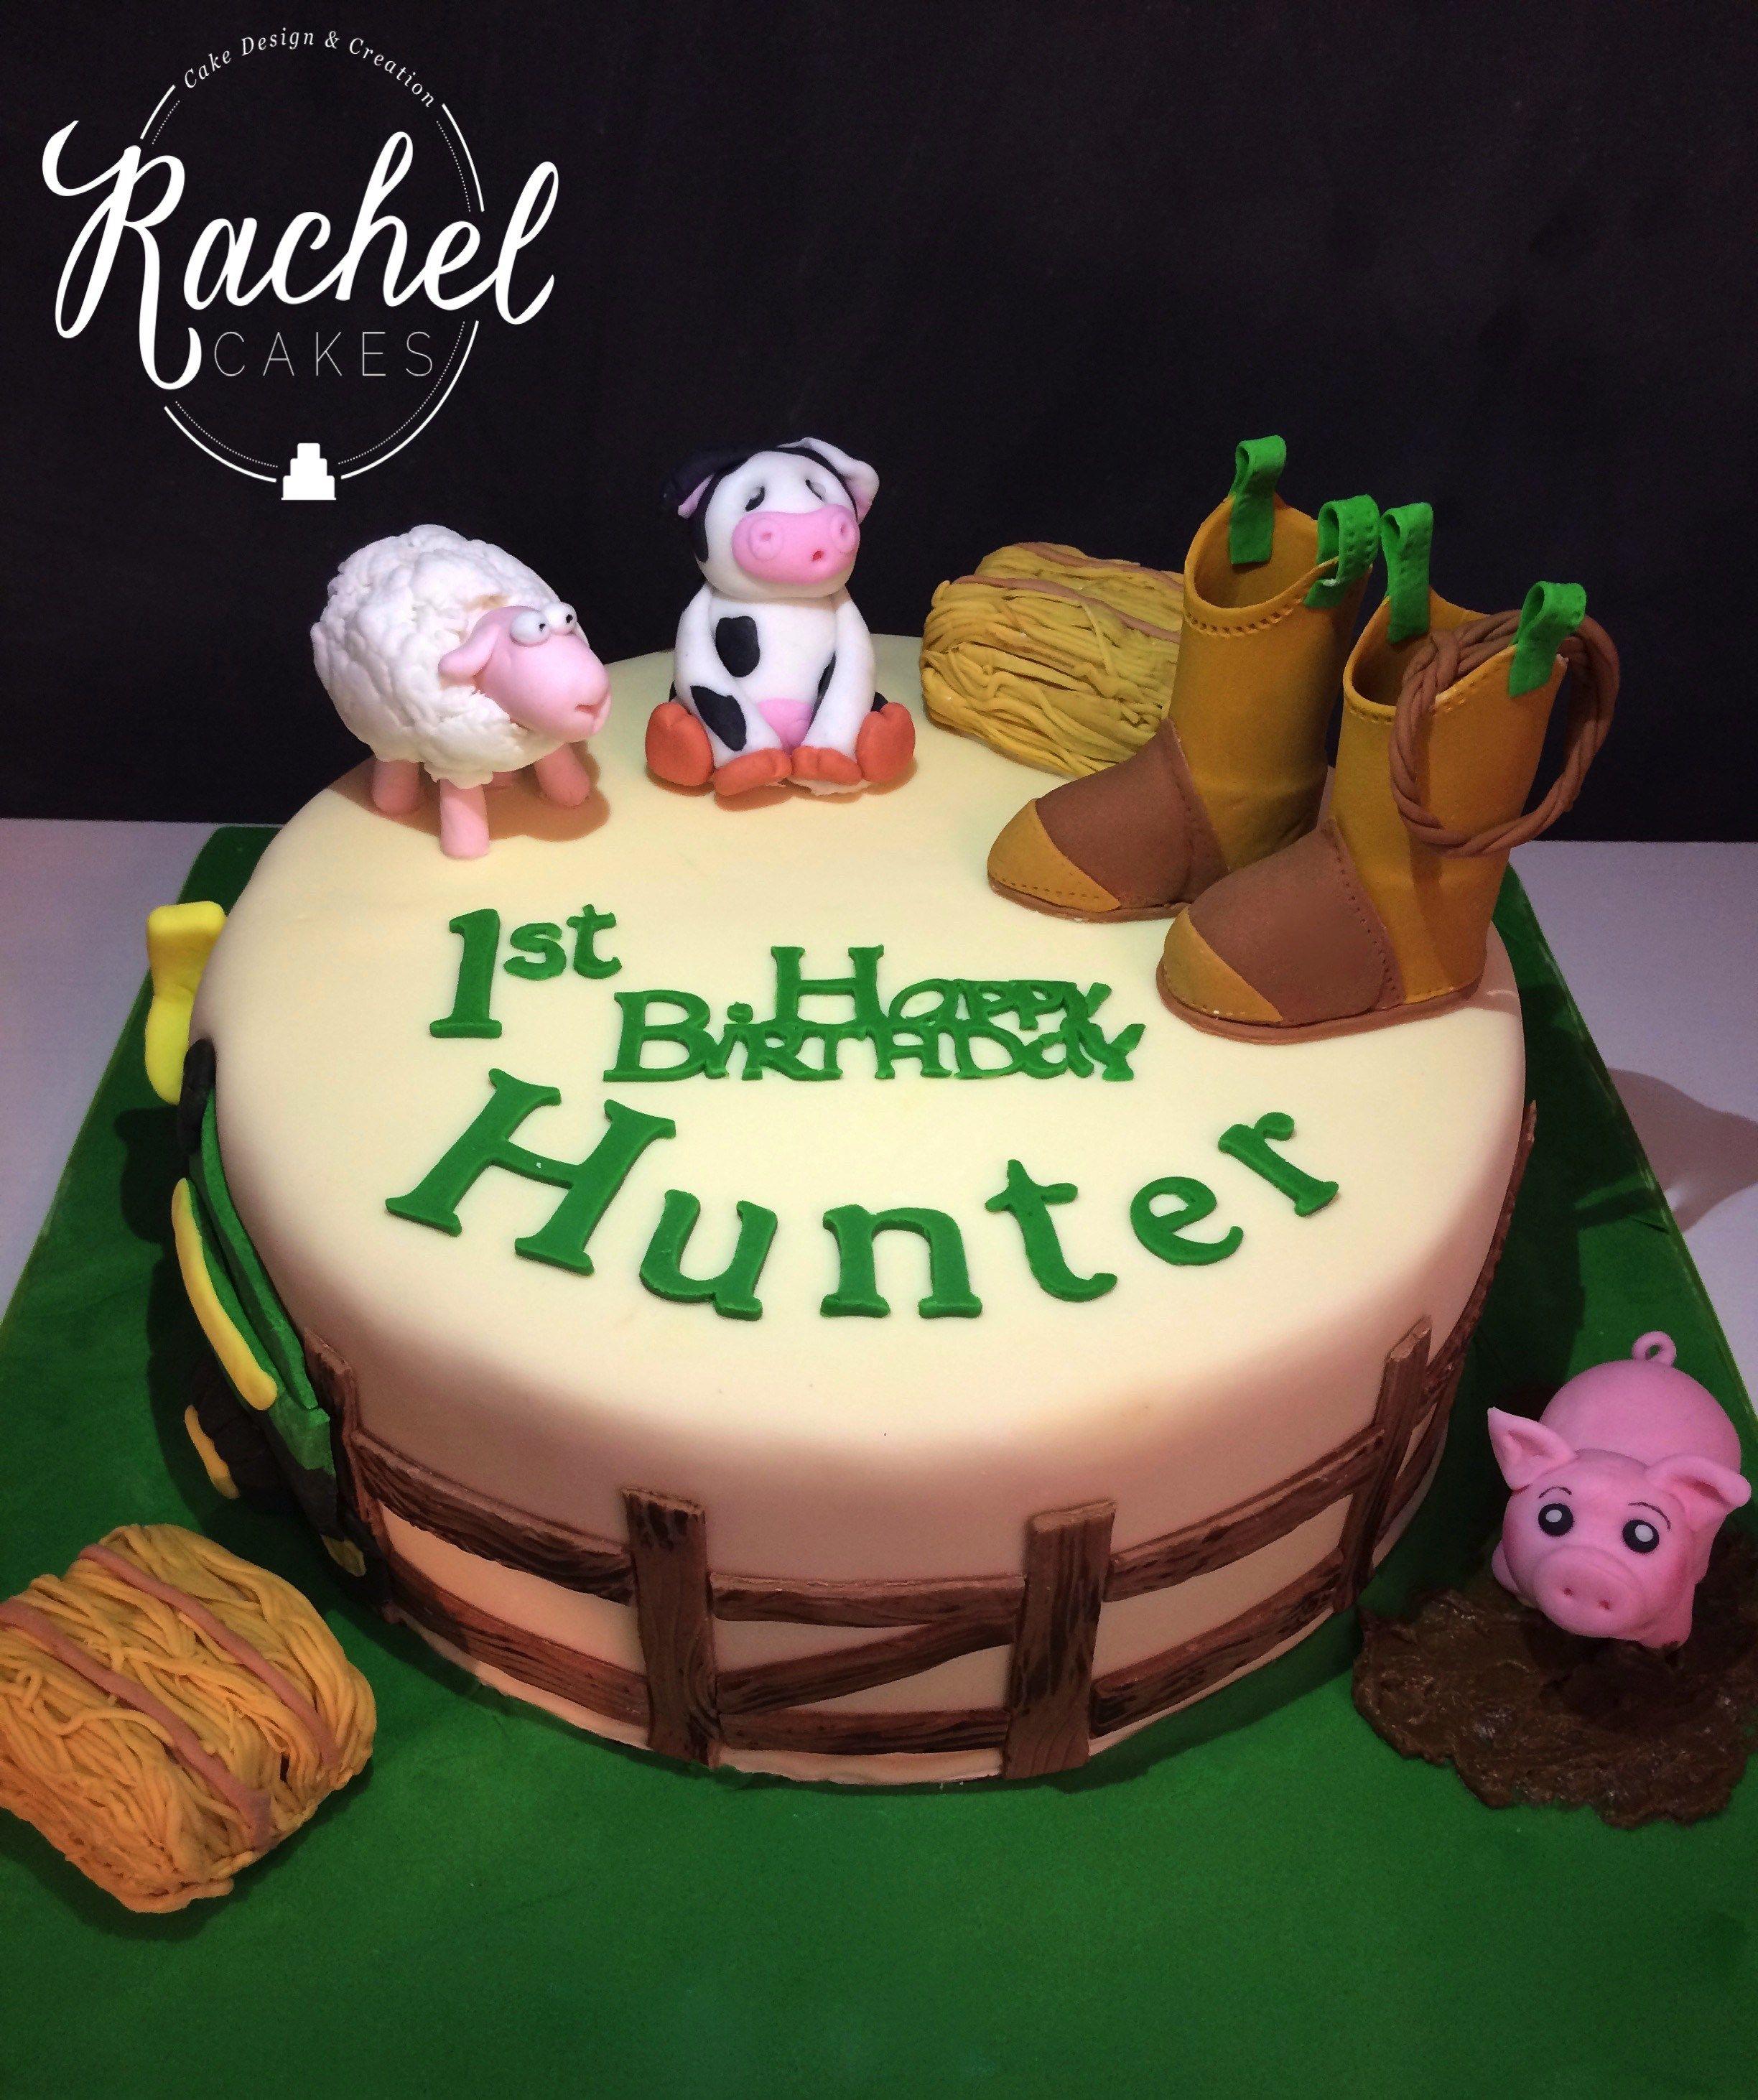 Blog Whats New Rachelcakes Themedsculptured Cakes Pinterest